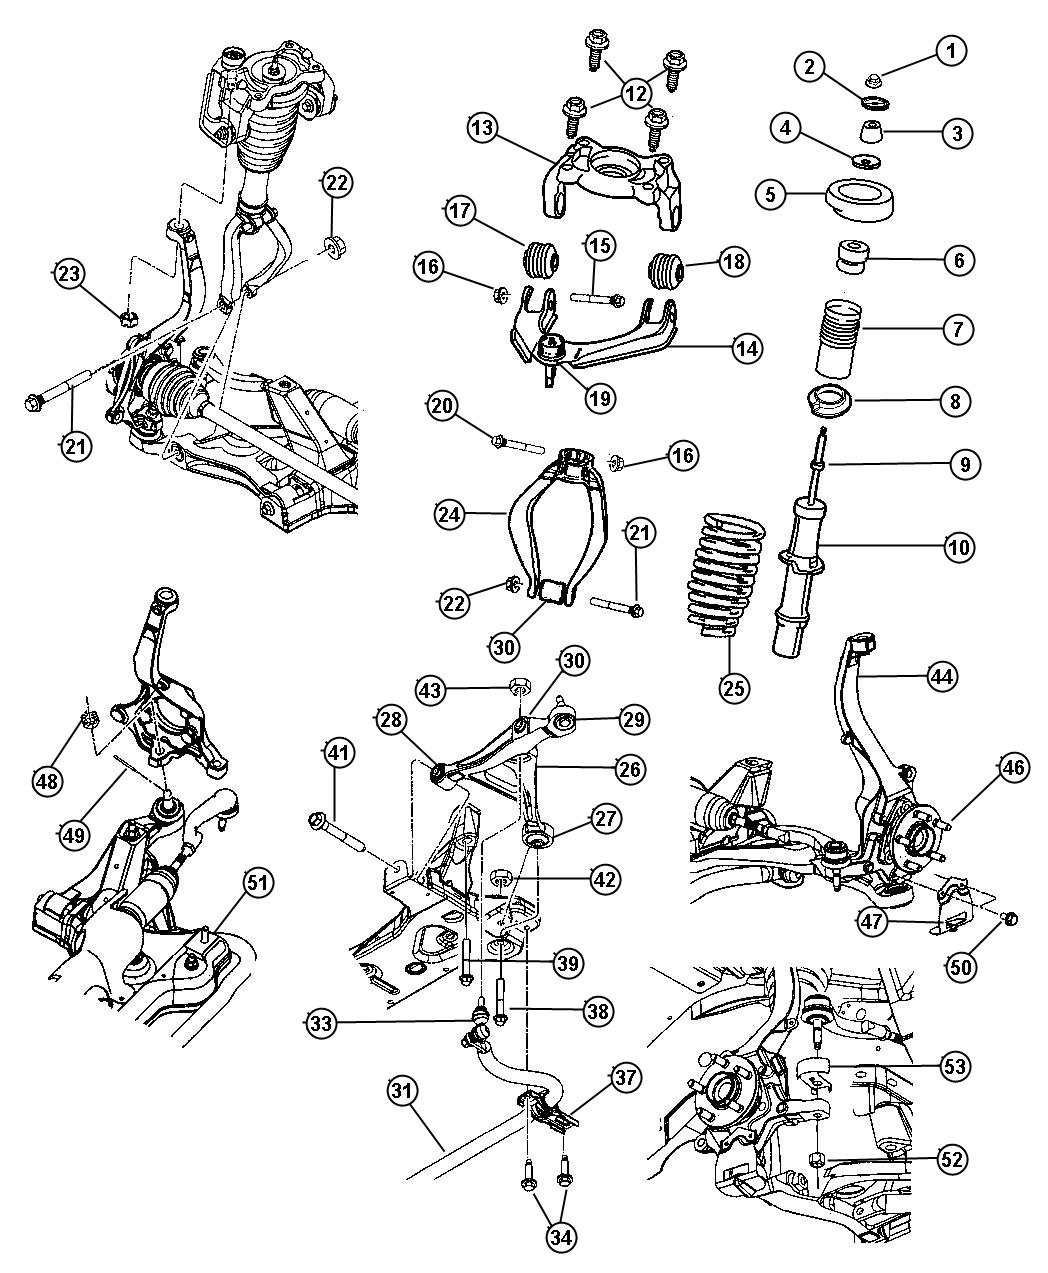 1967 camaro fuel gauge wiring diagram 1967 gto tach wiring diagram